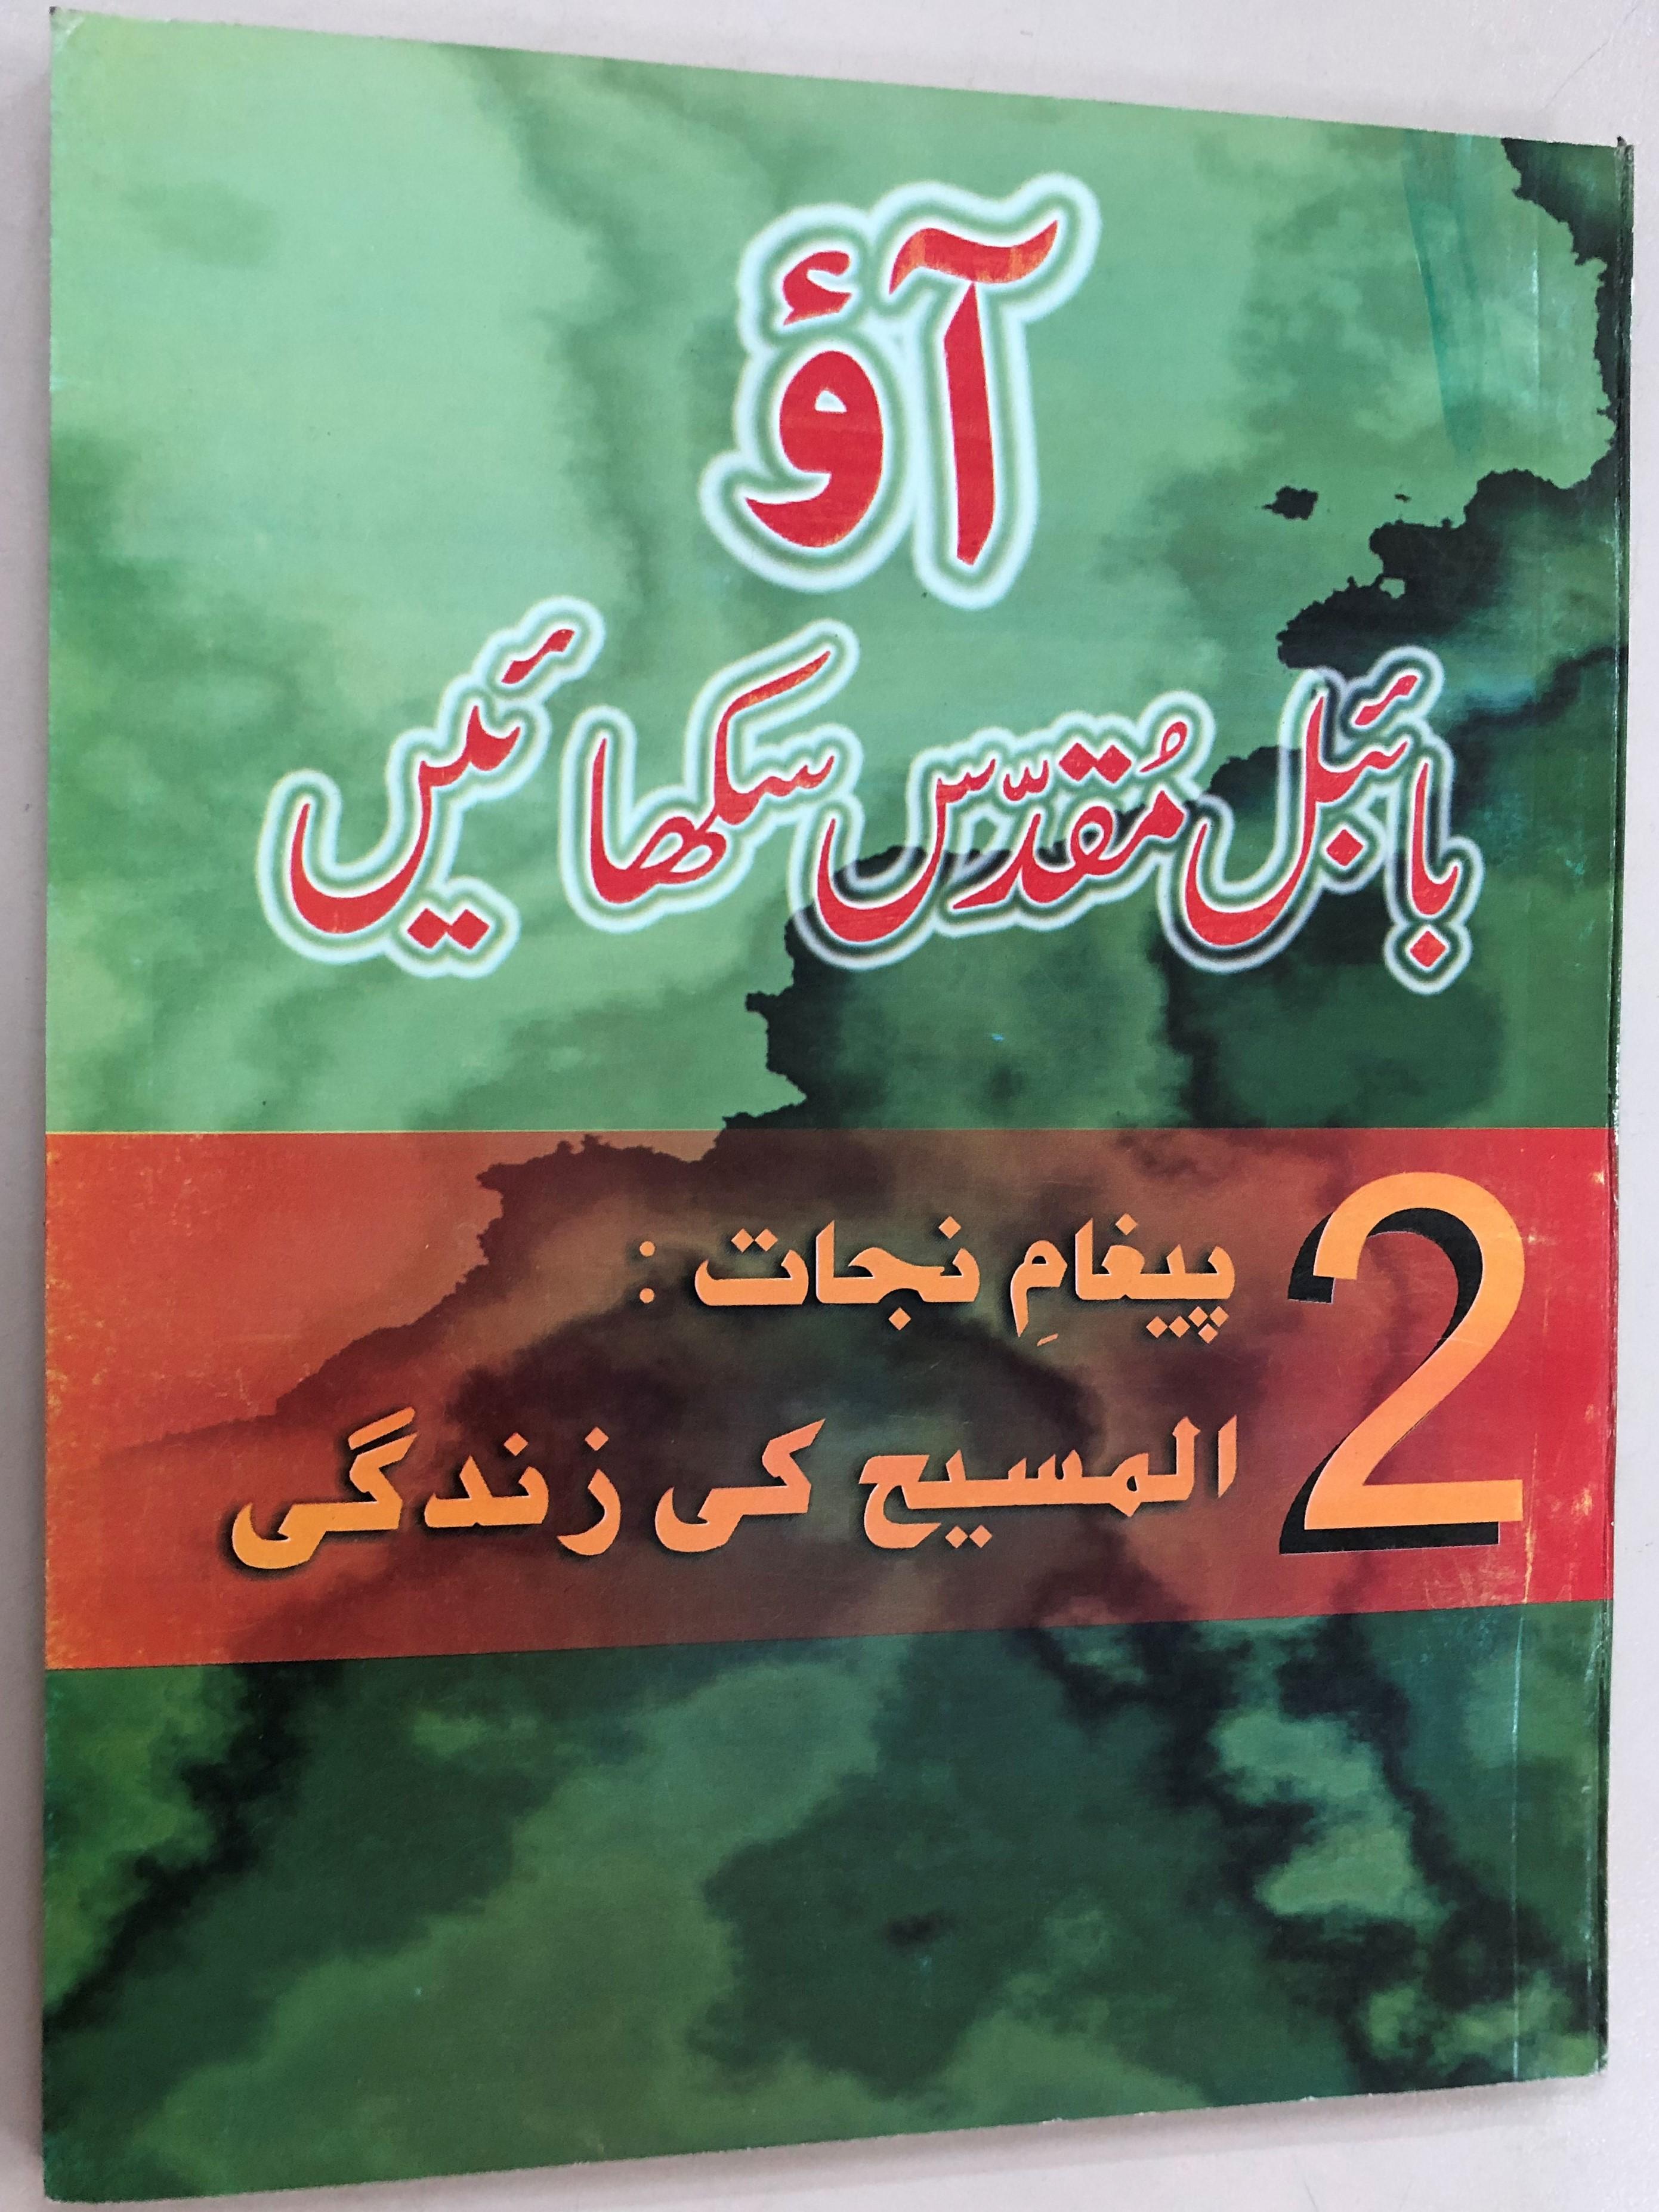 building-on-firm-foundations-vol.2-by-trevor-mcilwain-urdu-edition-evangelism-the-old-testament-pakistan-2007-1-.jpg